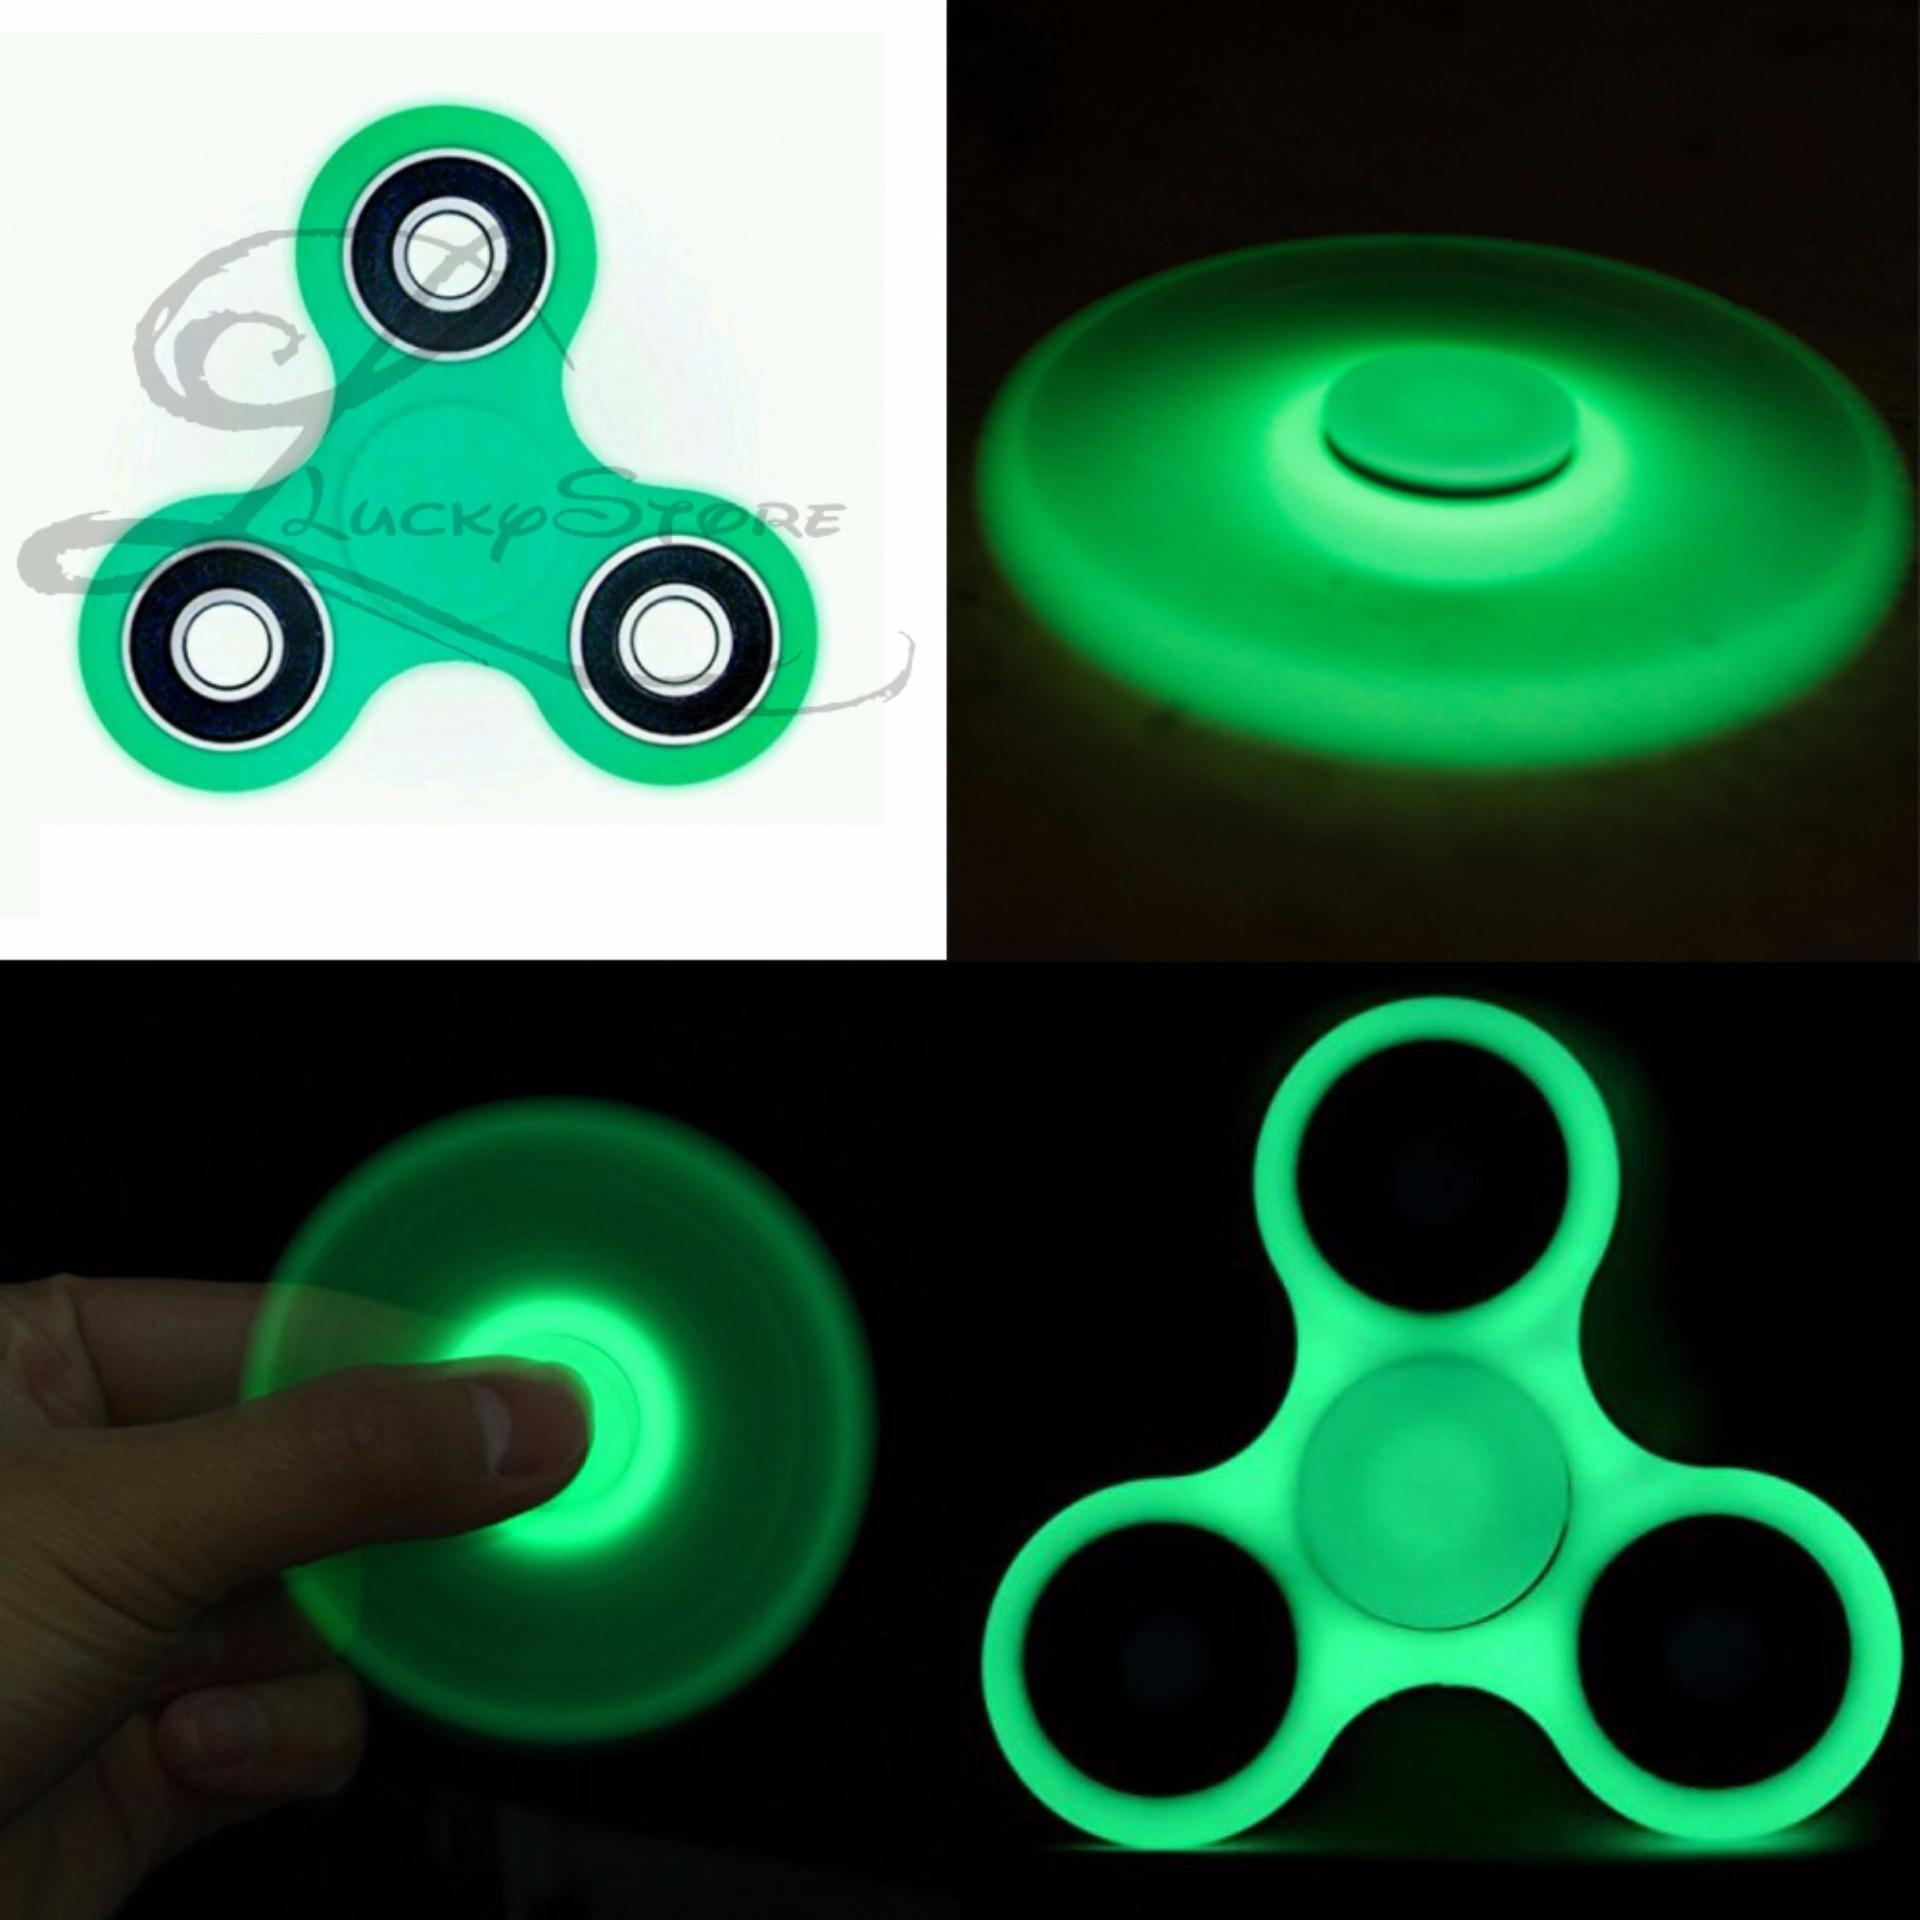 Lucky GLOW IN THE DARK Fidget Spinner Hand Spinner Hand Toys Focus Games / Mainan Spinner